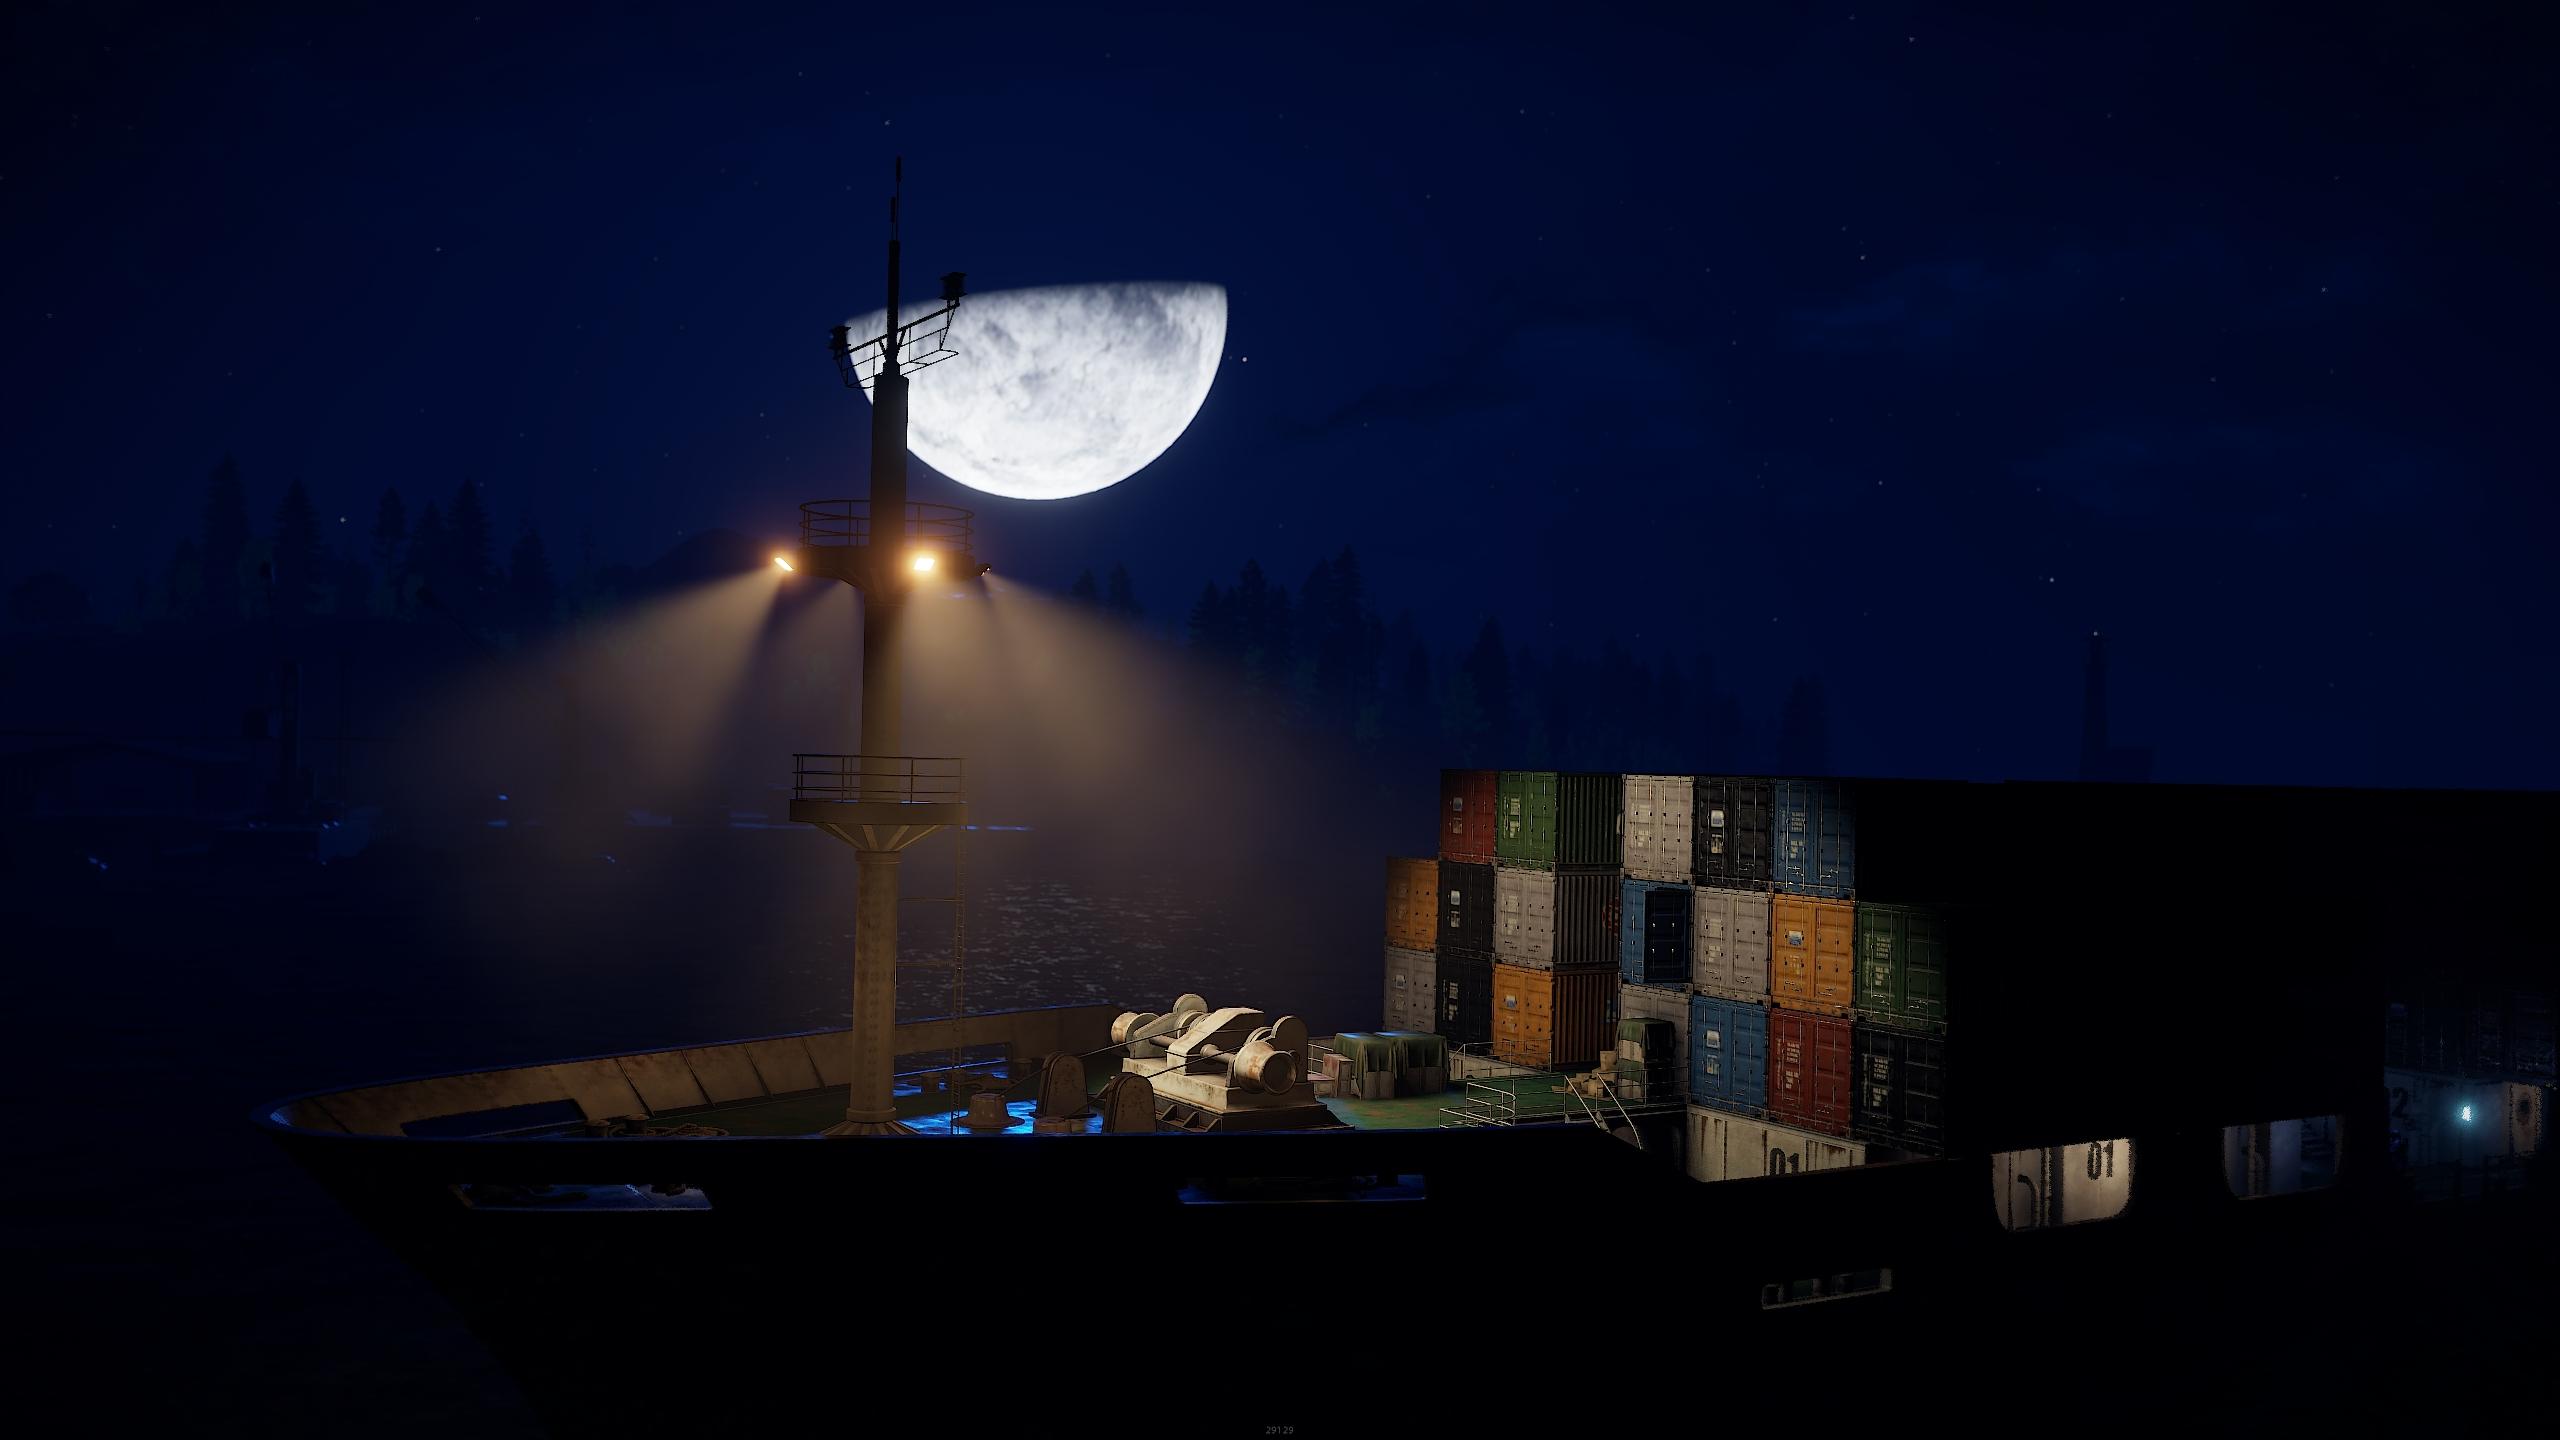 The_Cargo_Ship_Update_9.jpg